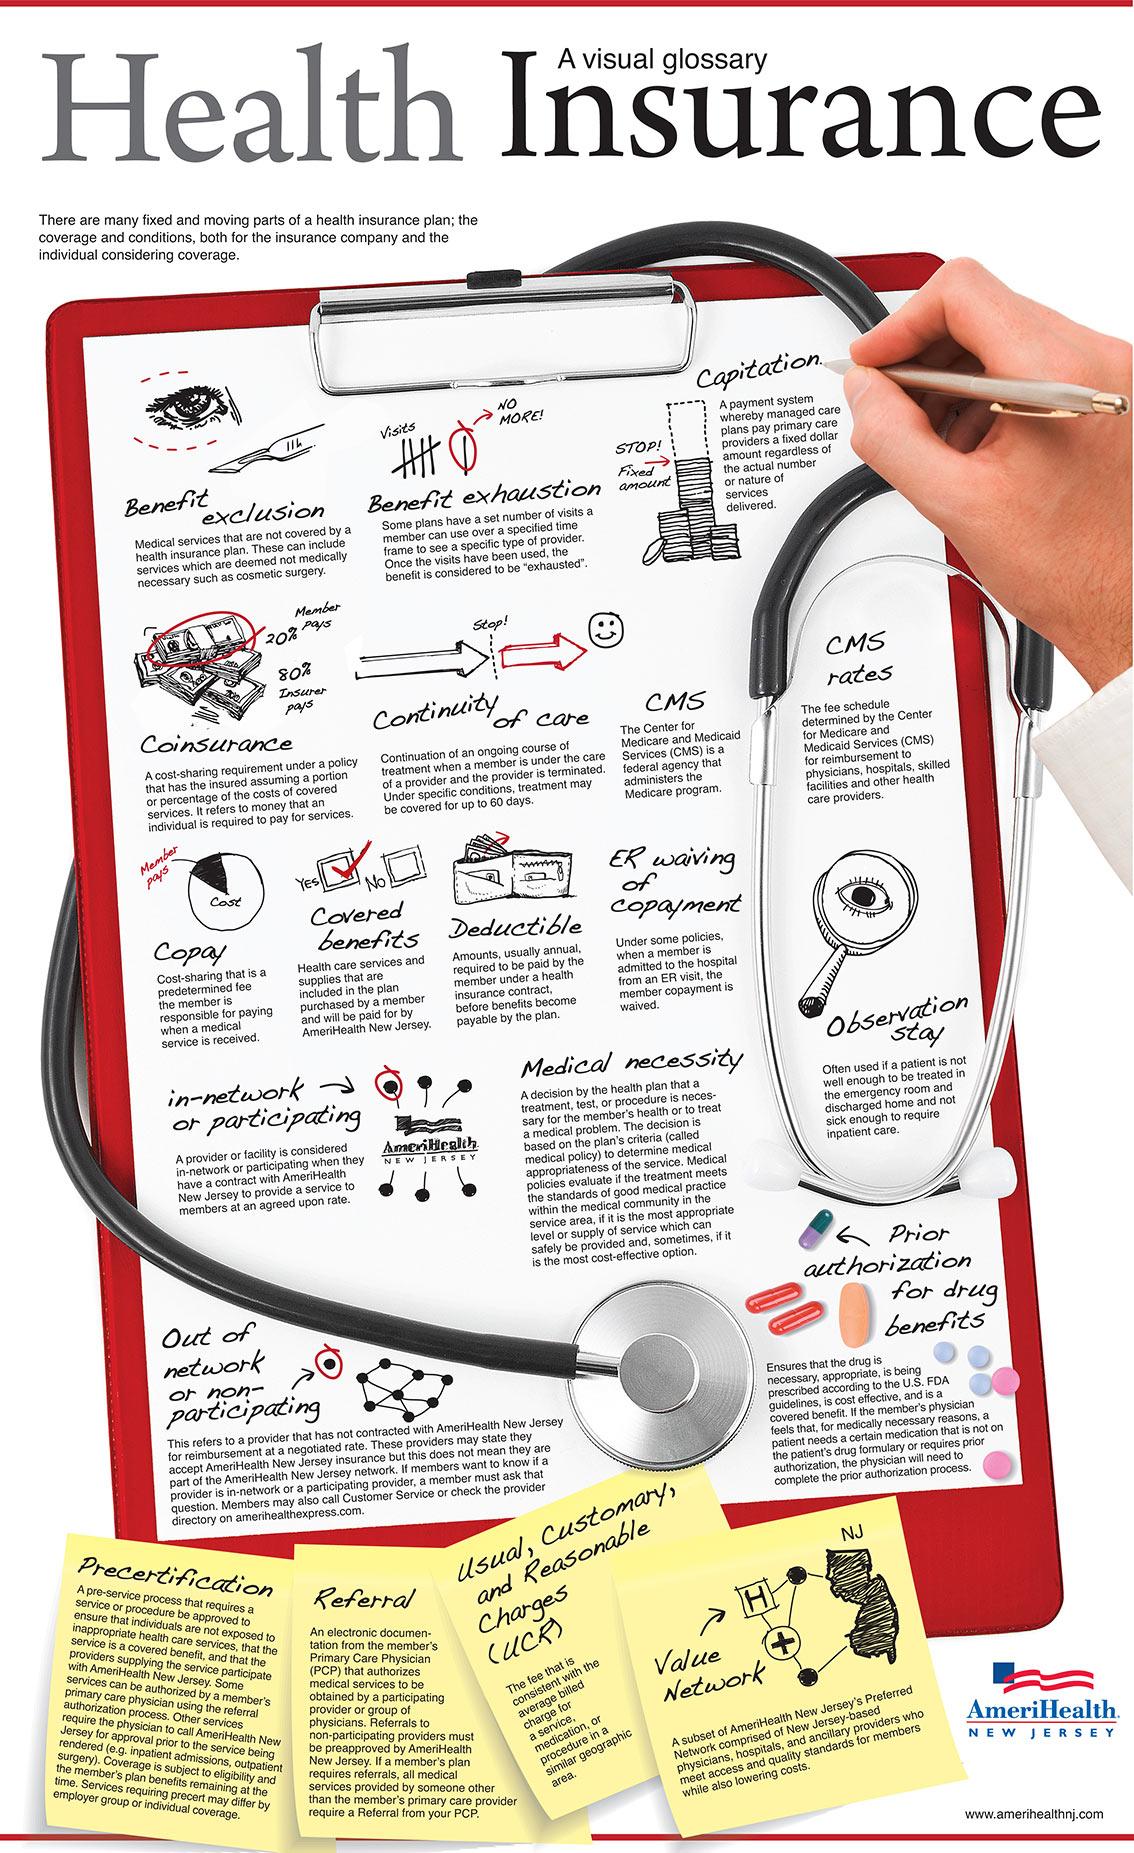 Health Insurance Visual Glossary